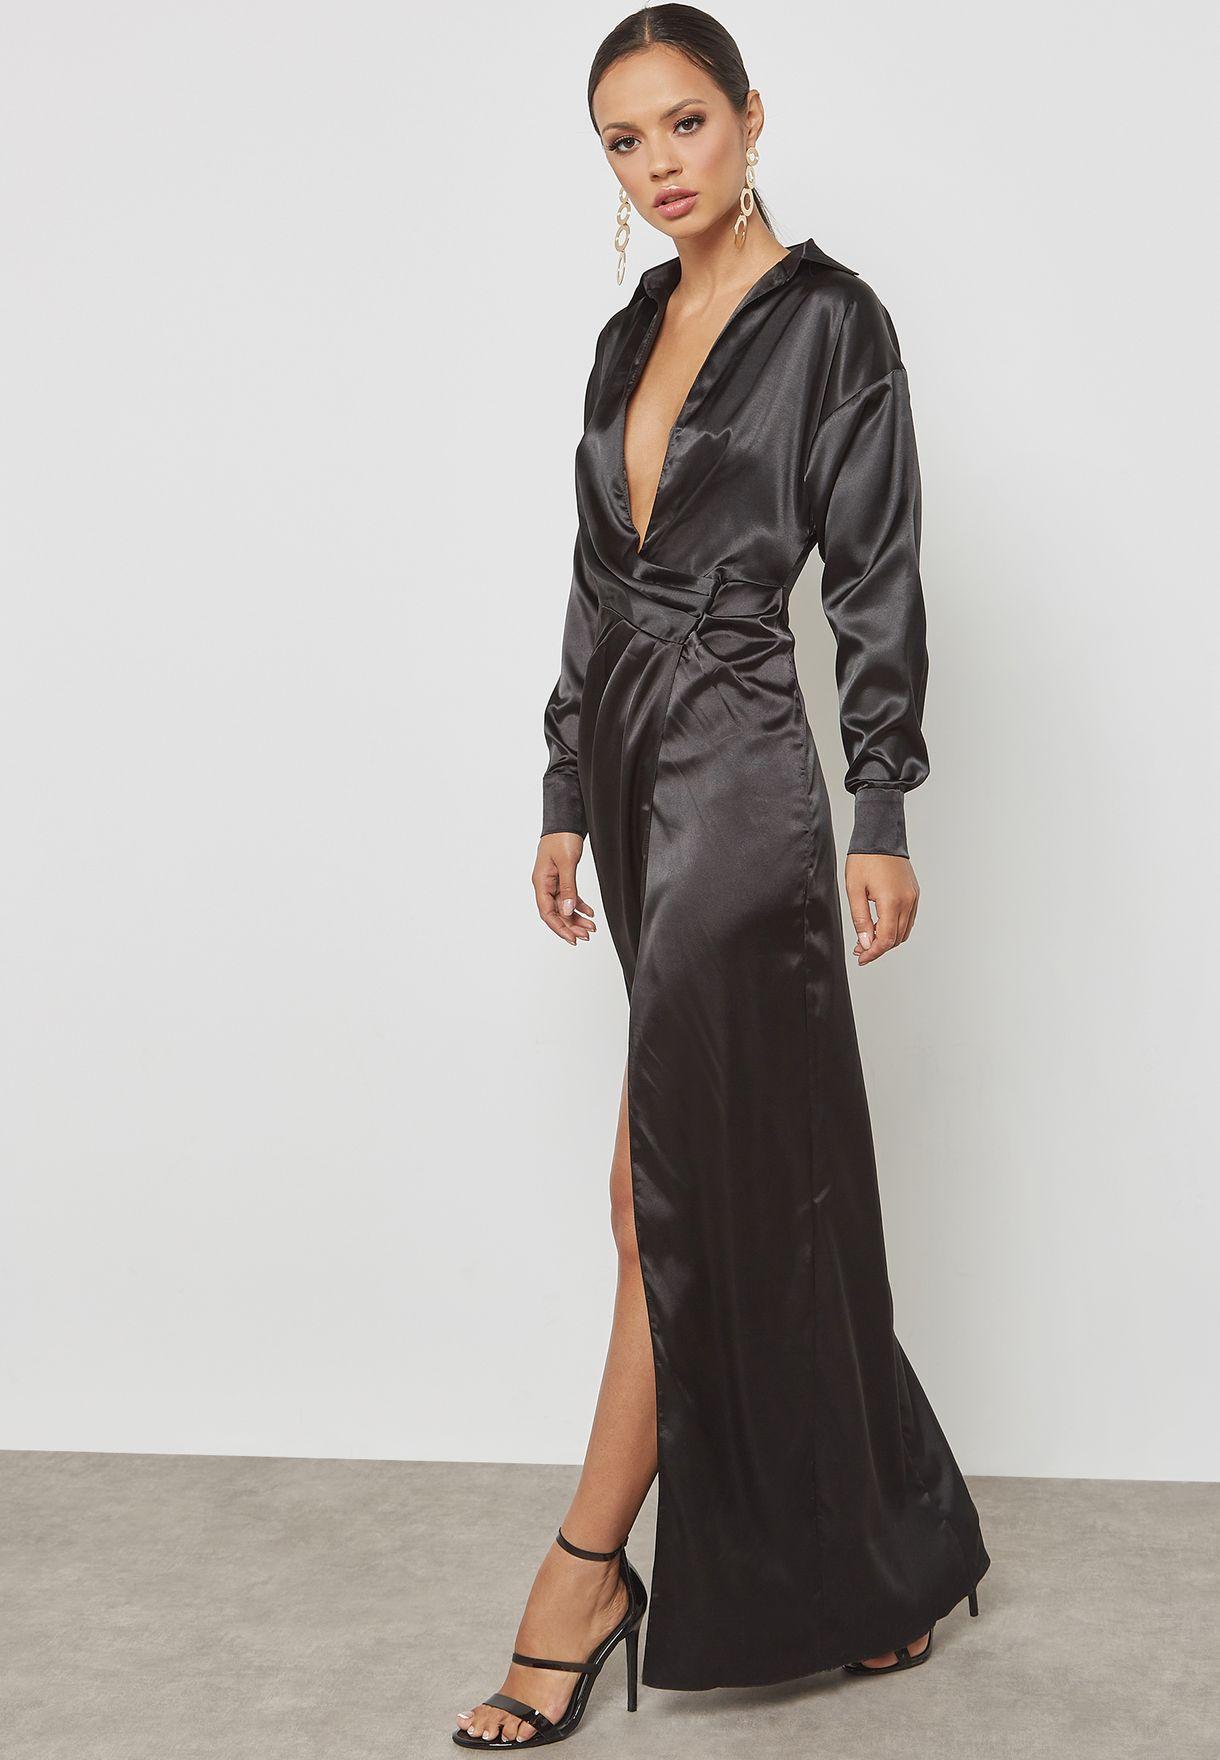 4b8cbb06b37a6 Shop Missguided black Satin Wrap Maxi Dress WSDE922042 for Women in ...